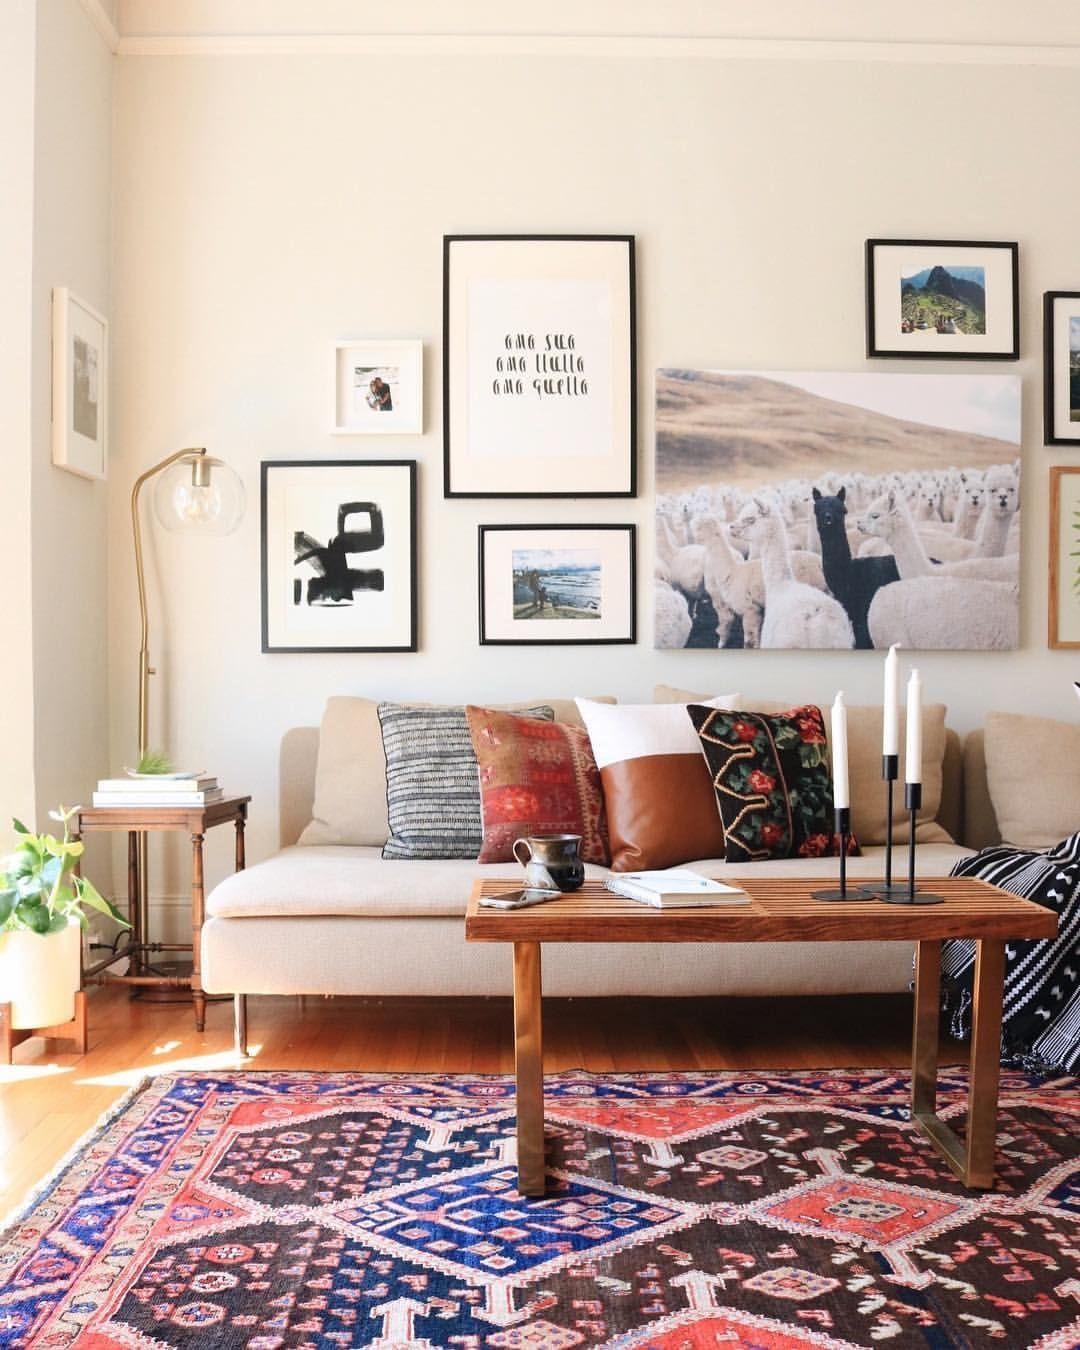 5 Living Rooms That Demonstrate Stylish Modern Design Trends: Boho Chic Fashion, Interior Design Ideas, Modern Interior